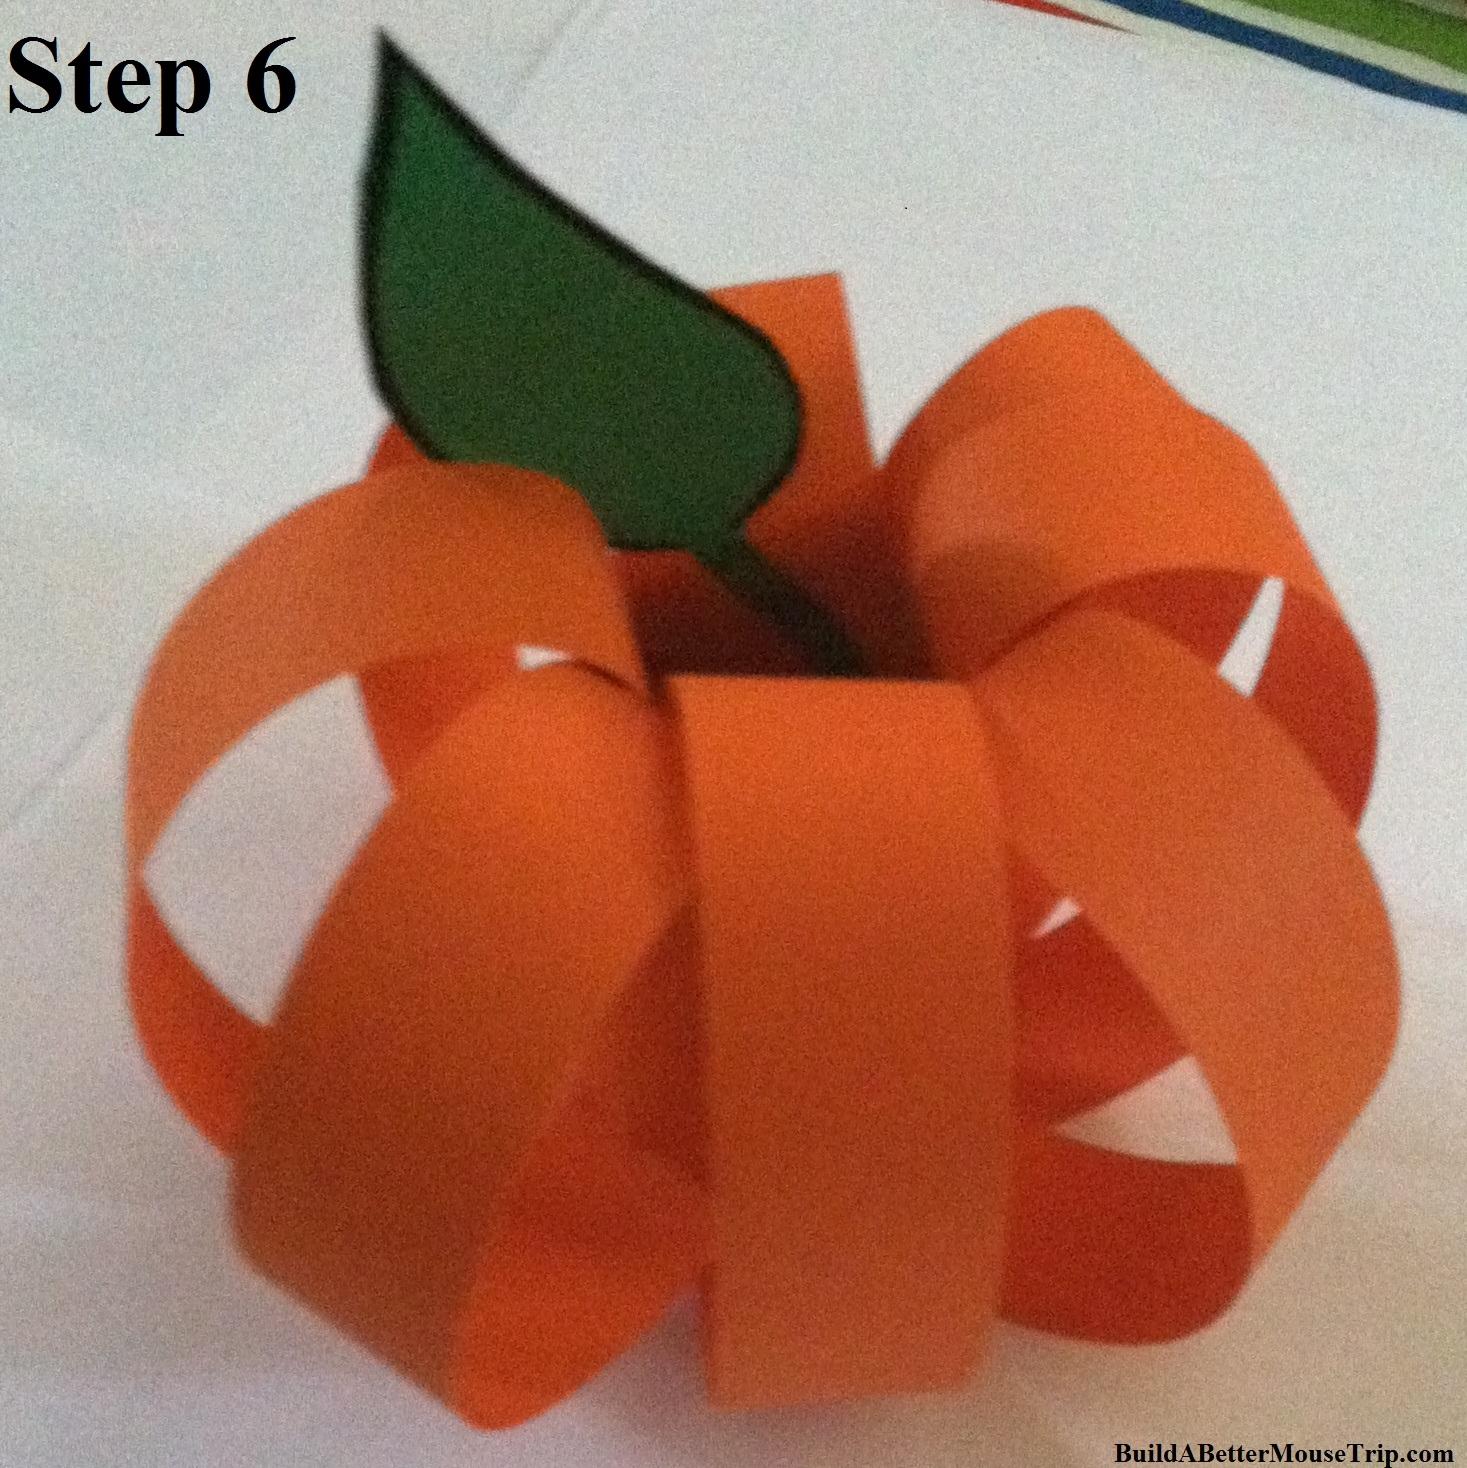 Step 6 - Add a leaf to your paper jack-o-lantern.